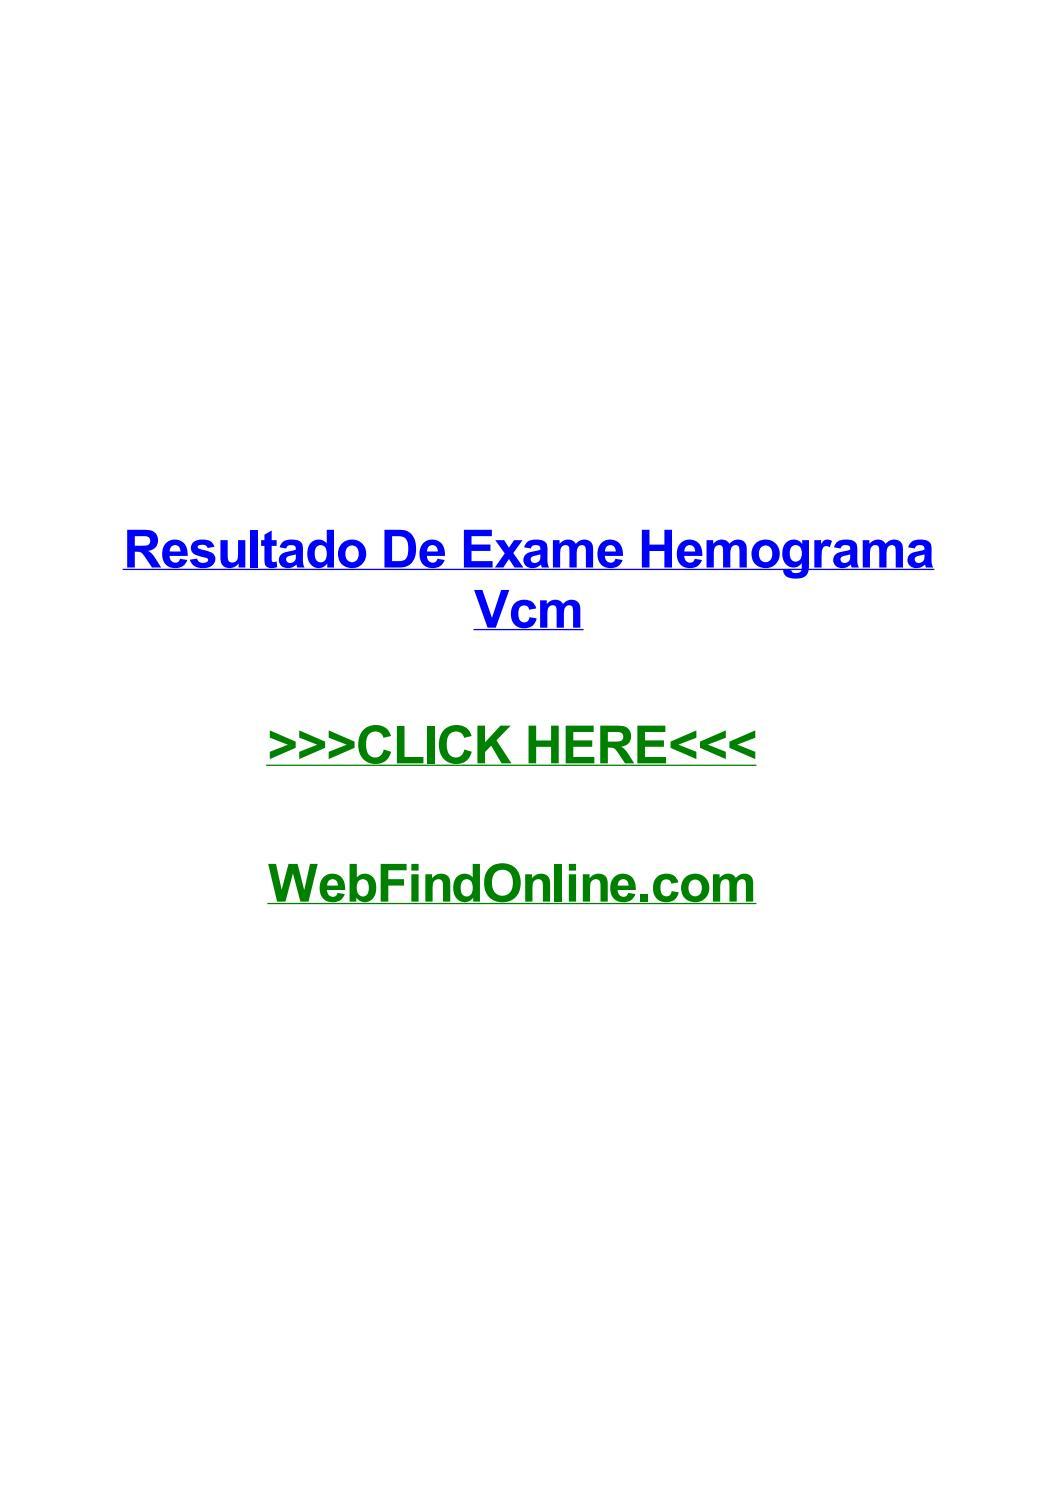 Resultado de exame hemograma vcm by chrisfwdc issuu fandeluxe Image collections